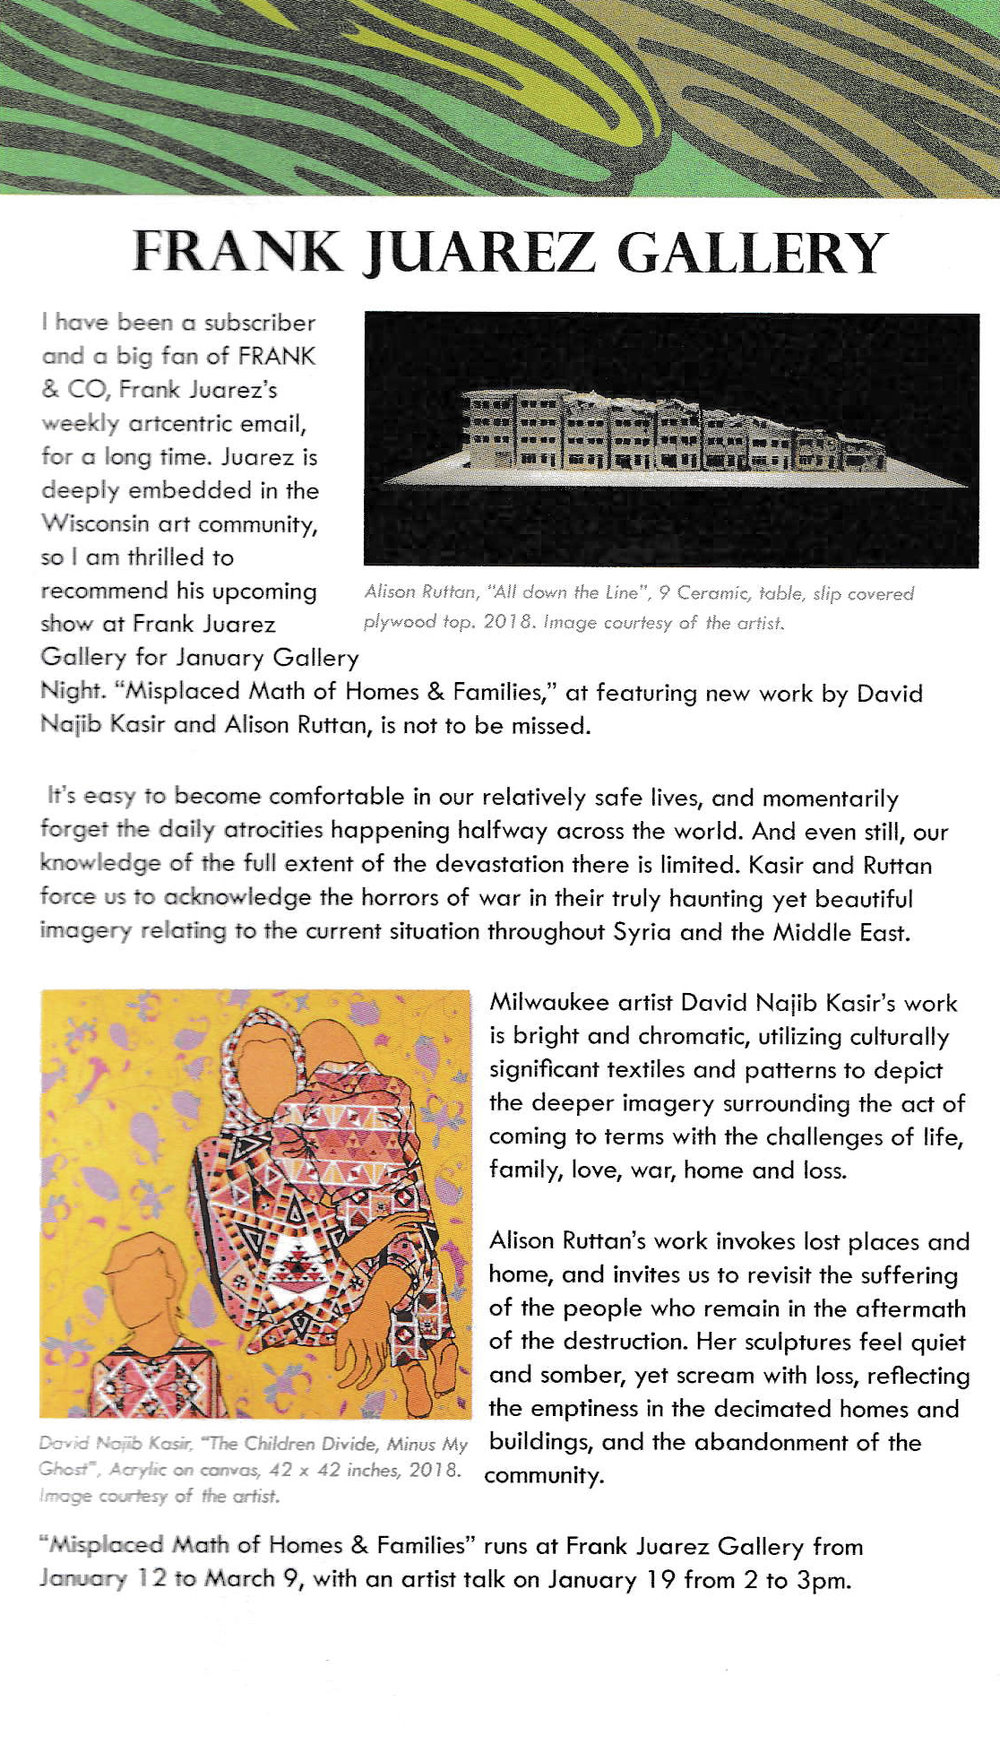 Jan2019_GalleryNight_review_Sara_Mulloy copy.jpg